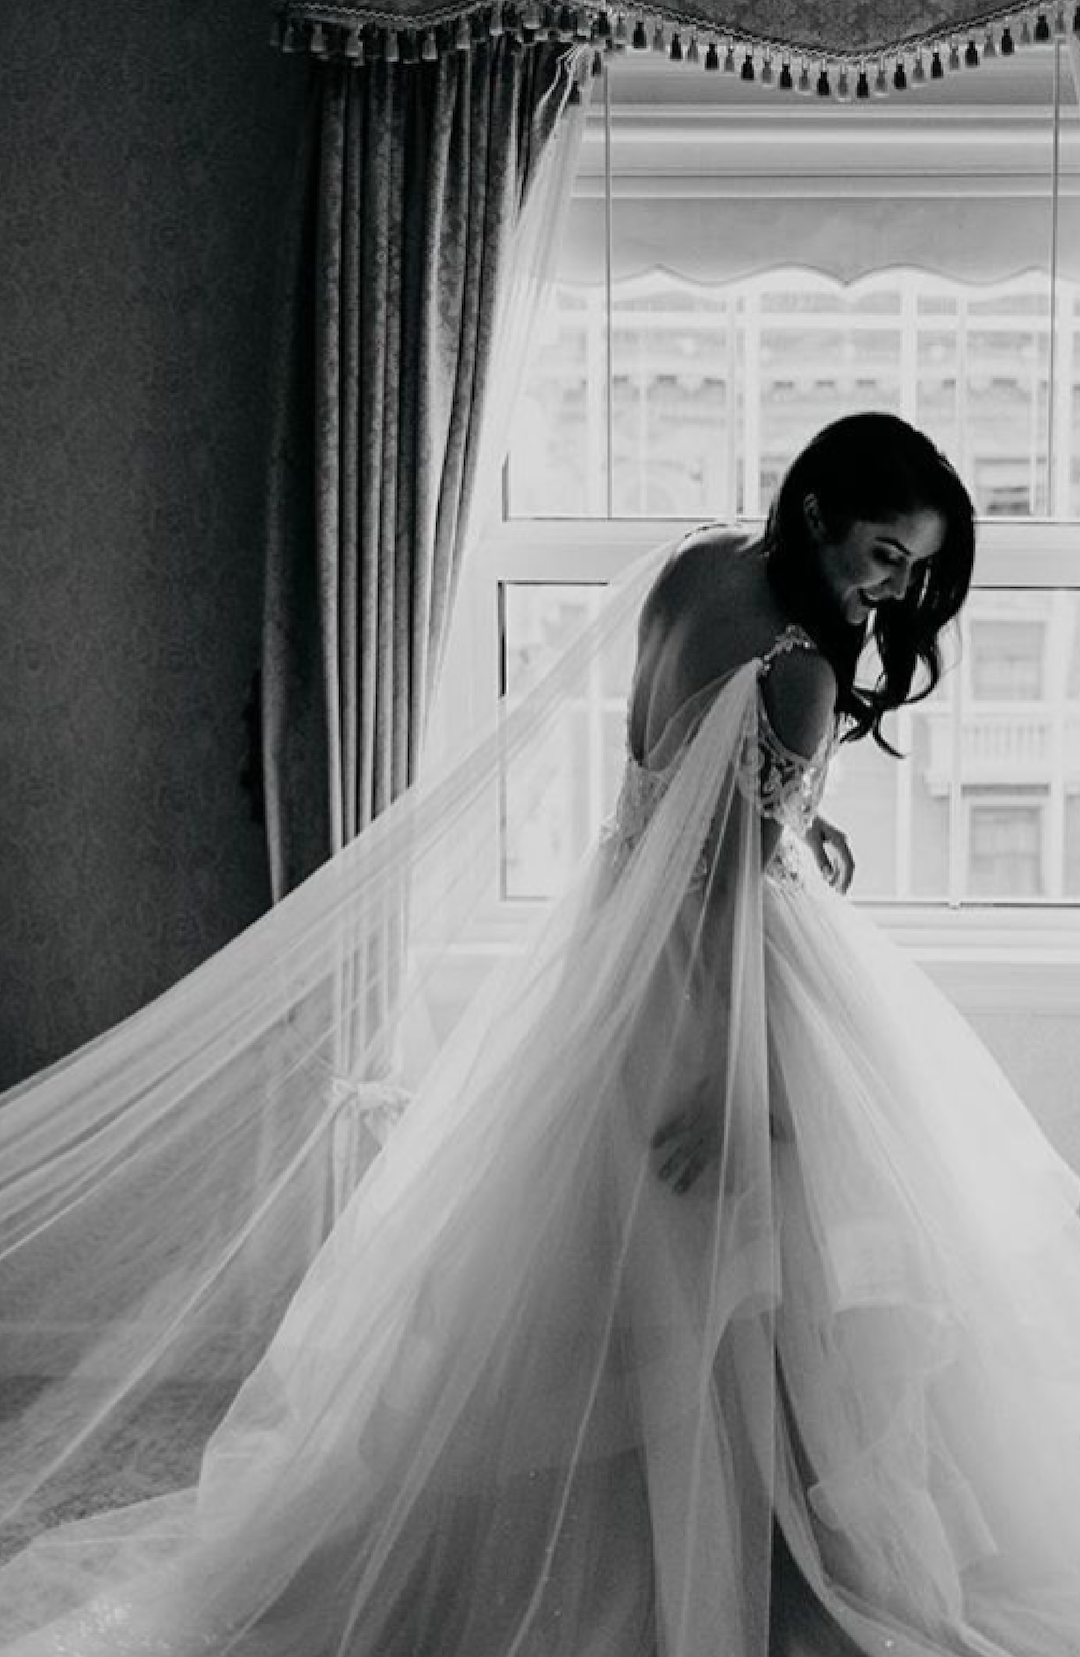 Bridal Cape, Cape Veil, Wedding Veil, Cathedral Veil Cape, Champagne and GRIT